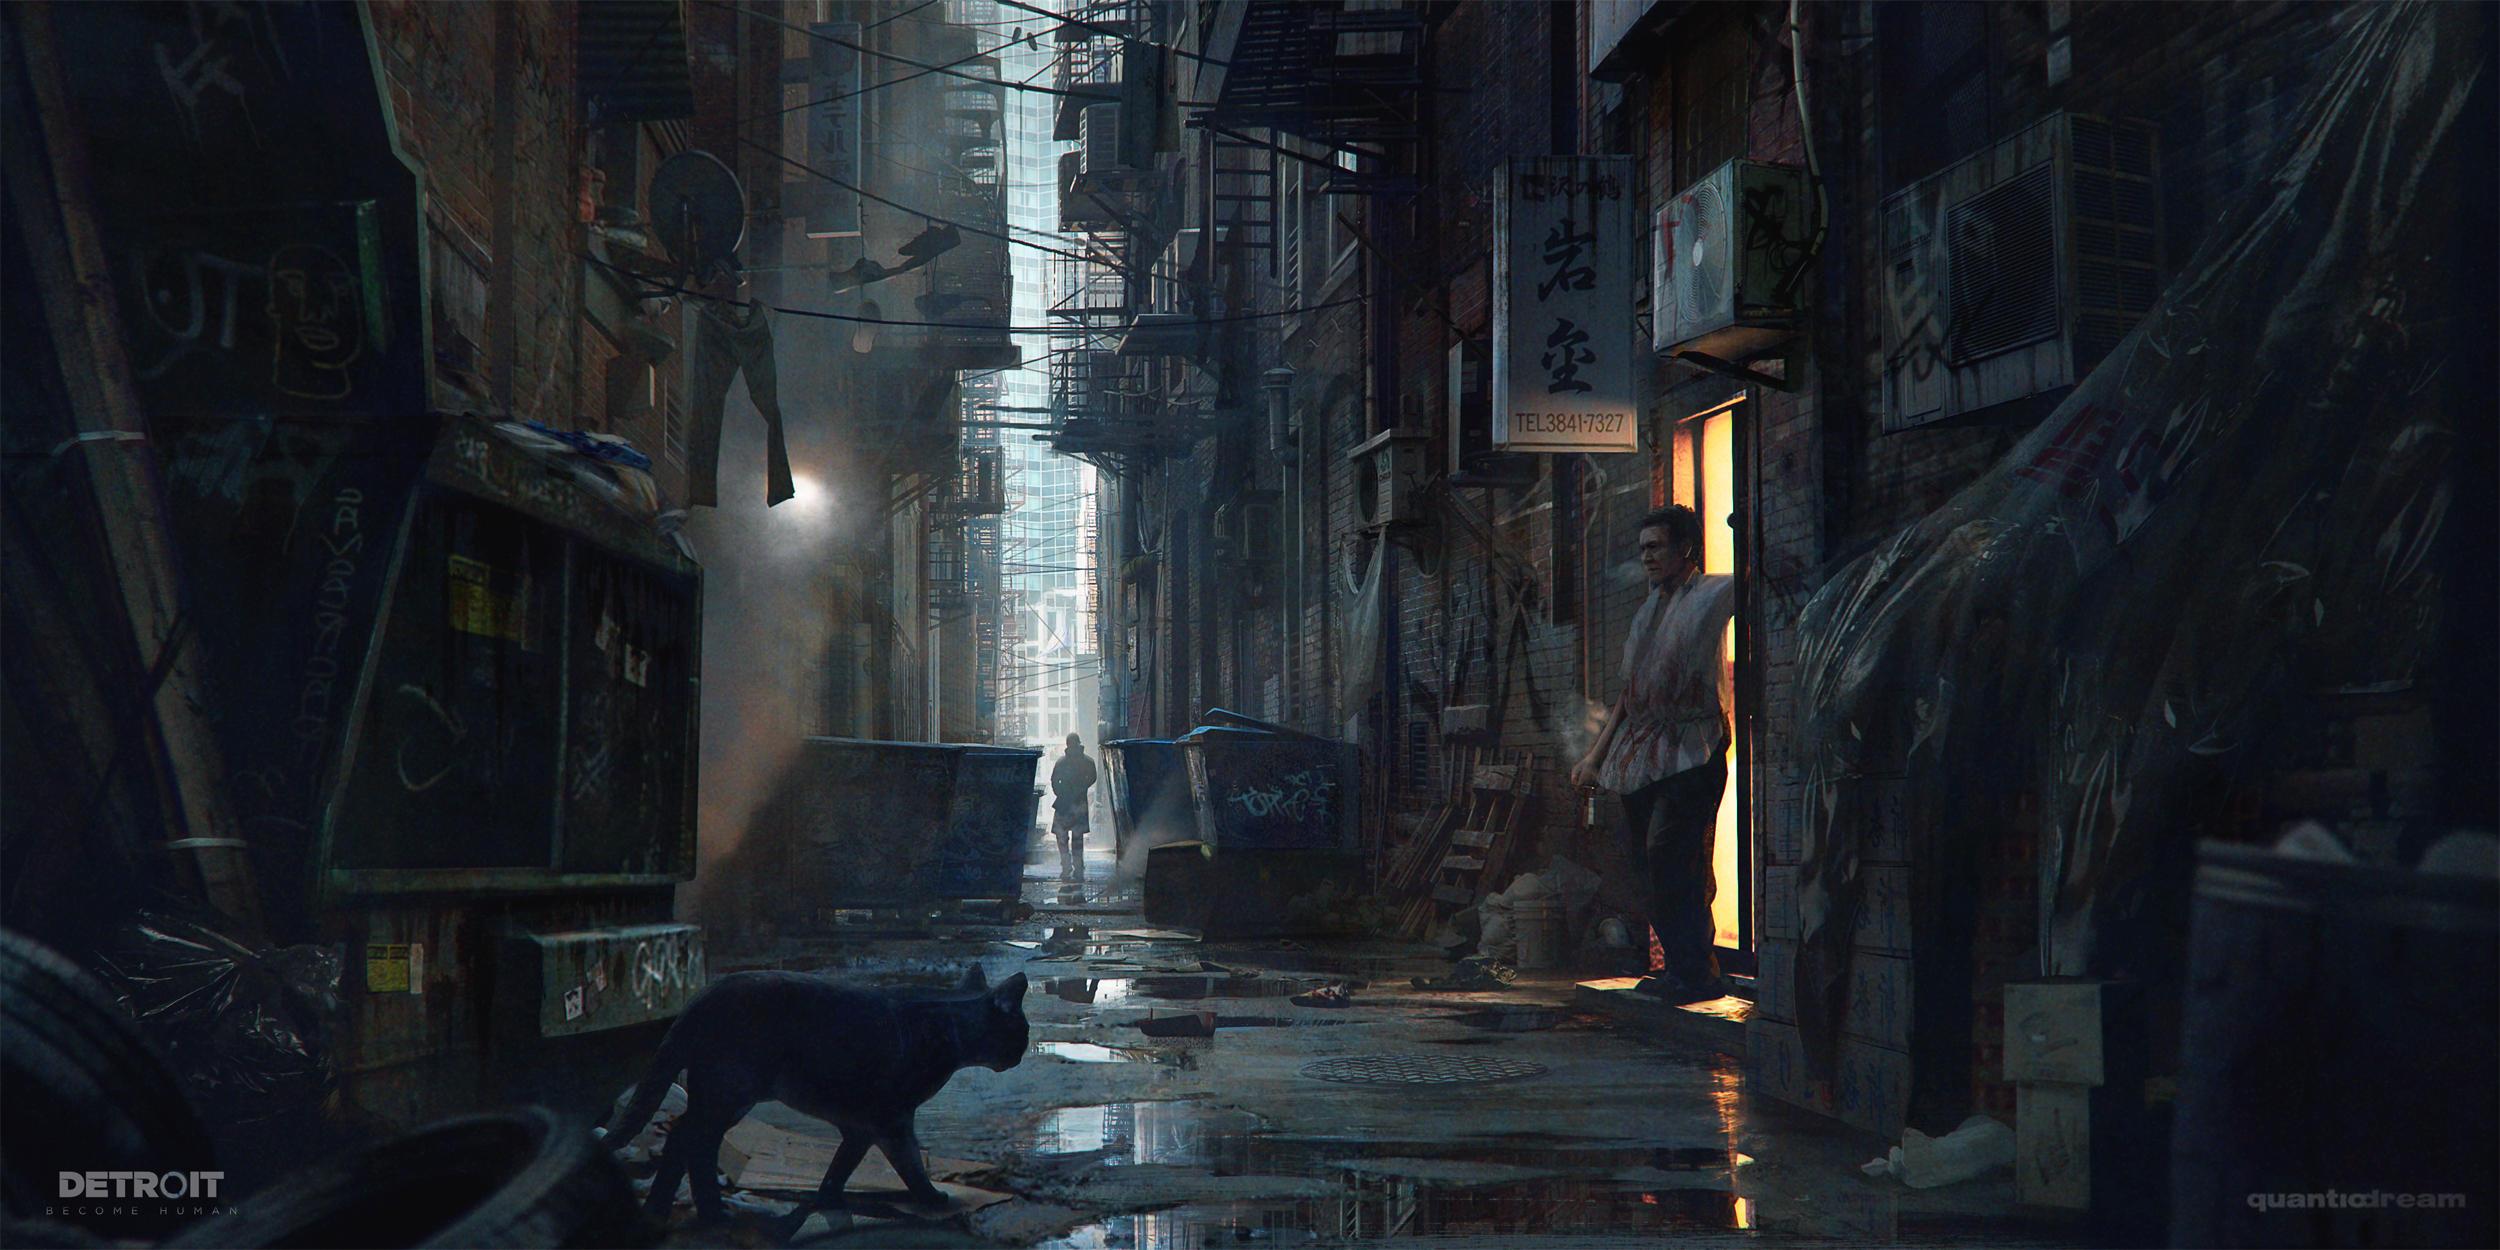 Alleyway - Detroit: Become Human by WojtekFus